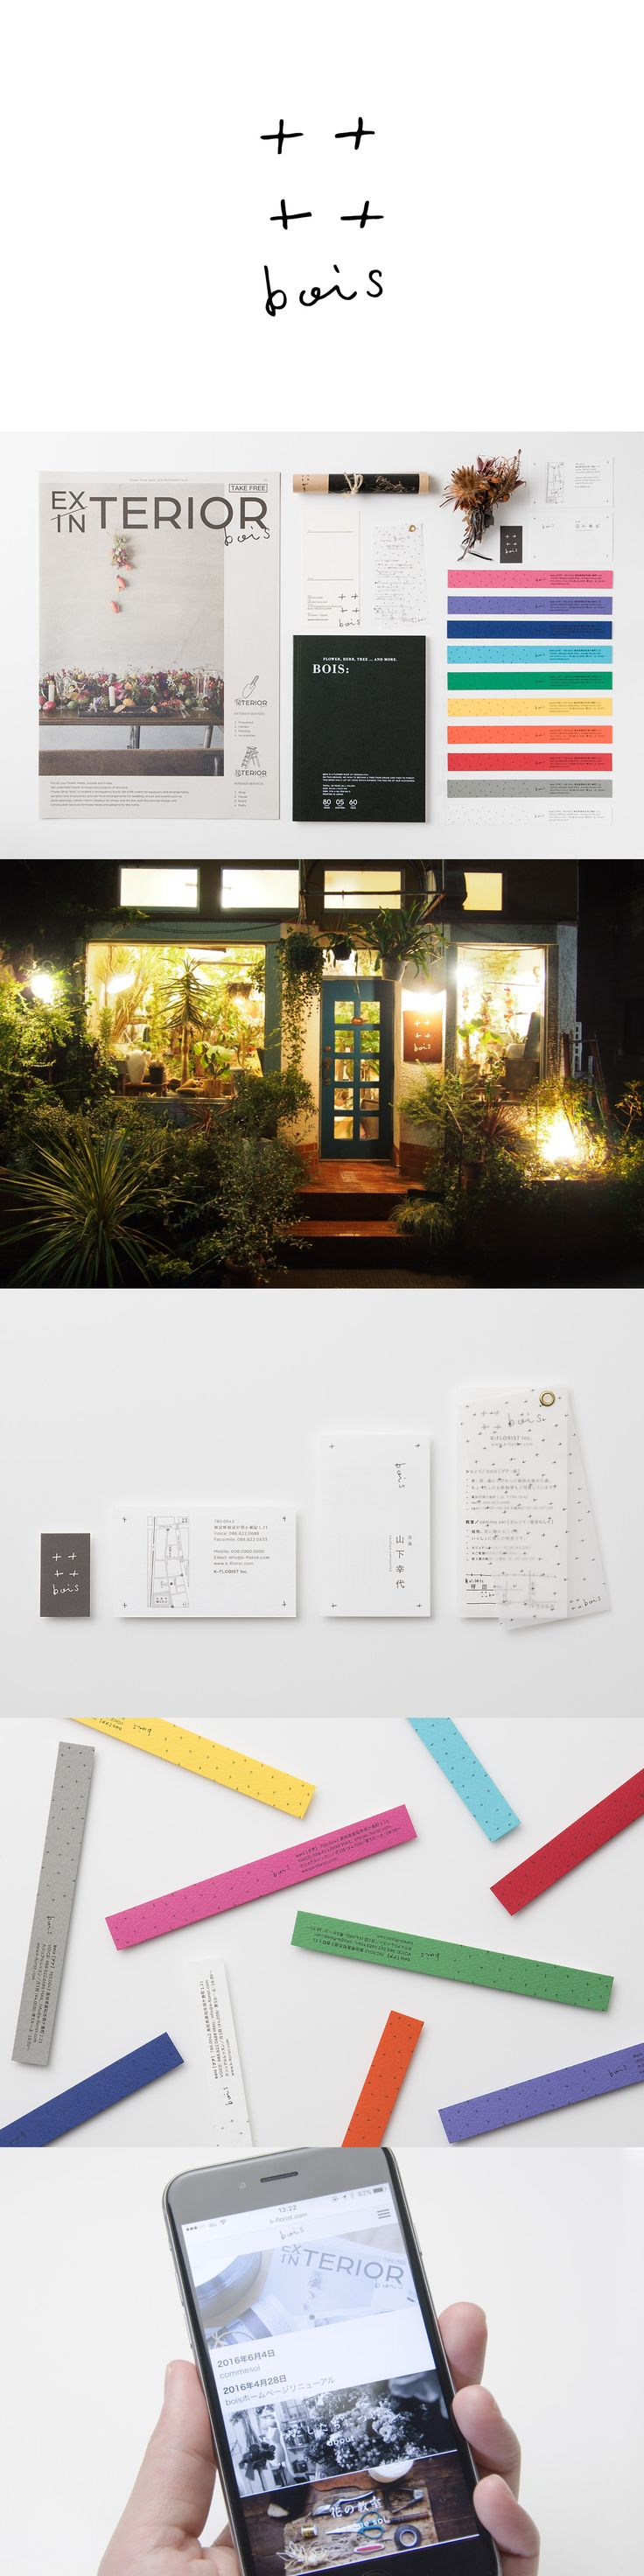 #graphic #graphicdesign #design #artdirection #ad #advertising #branding #brandingdesign #branddesign #identity #brandidentity #corporateidentity #visualidentity #logo #logodesign #logotype #symbol #symbolmark #mark #emblem #package #packaging #packagingdesign #typo #typography #typographic #typodesign #japan #flower #flowershop #florist